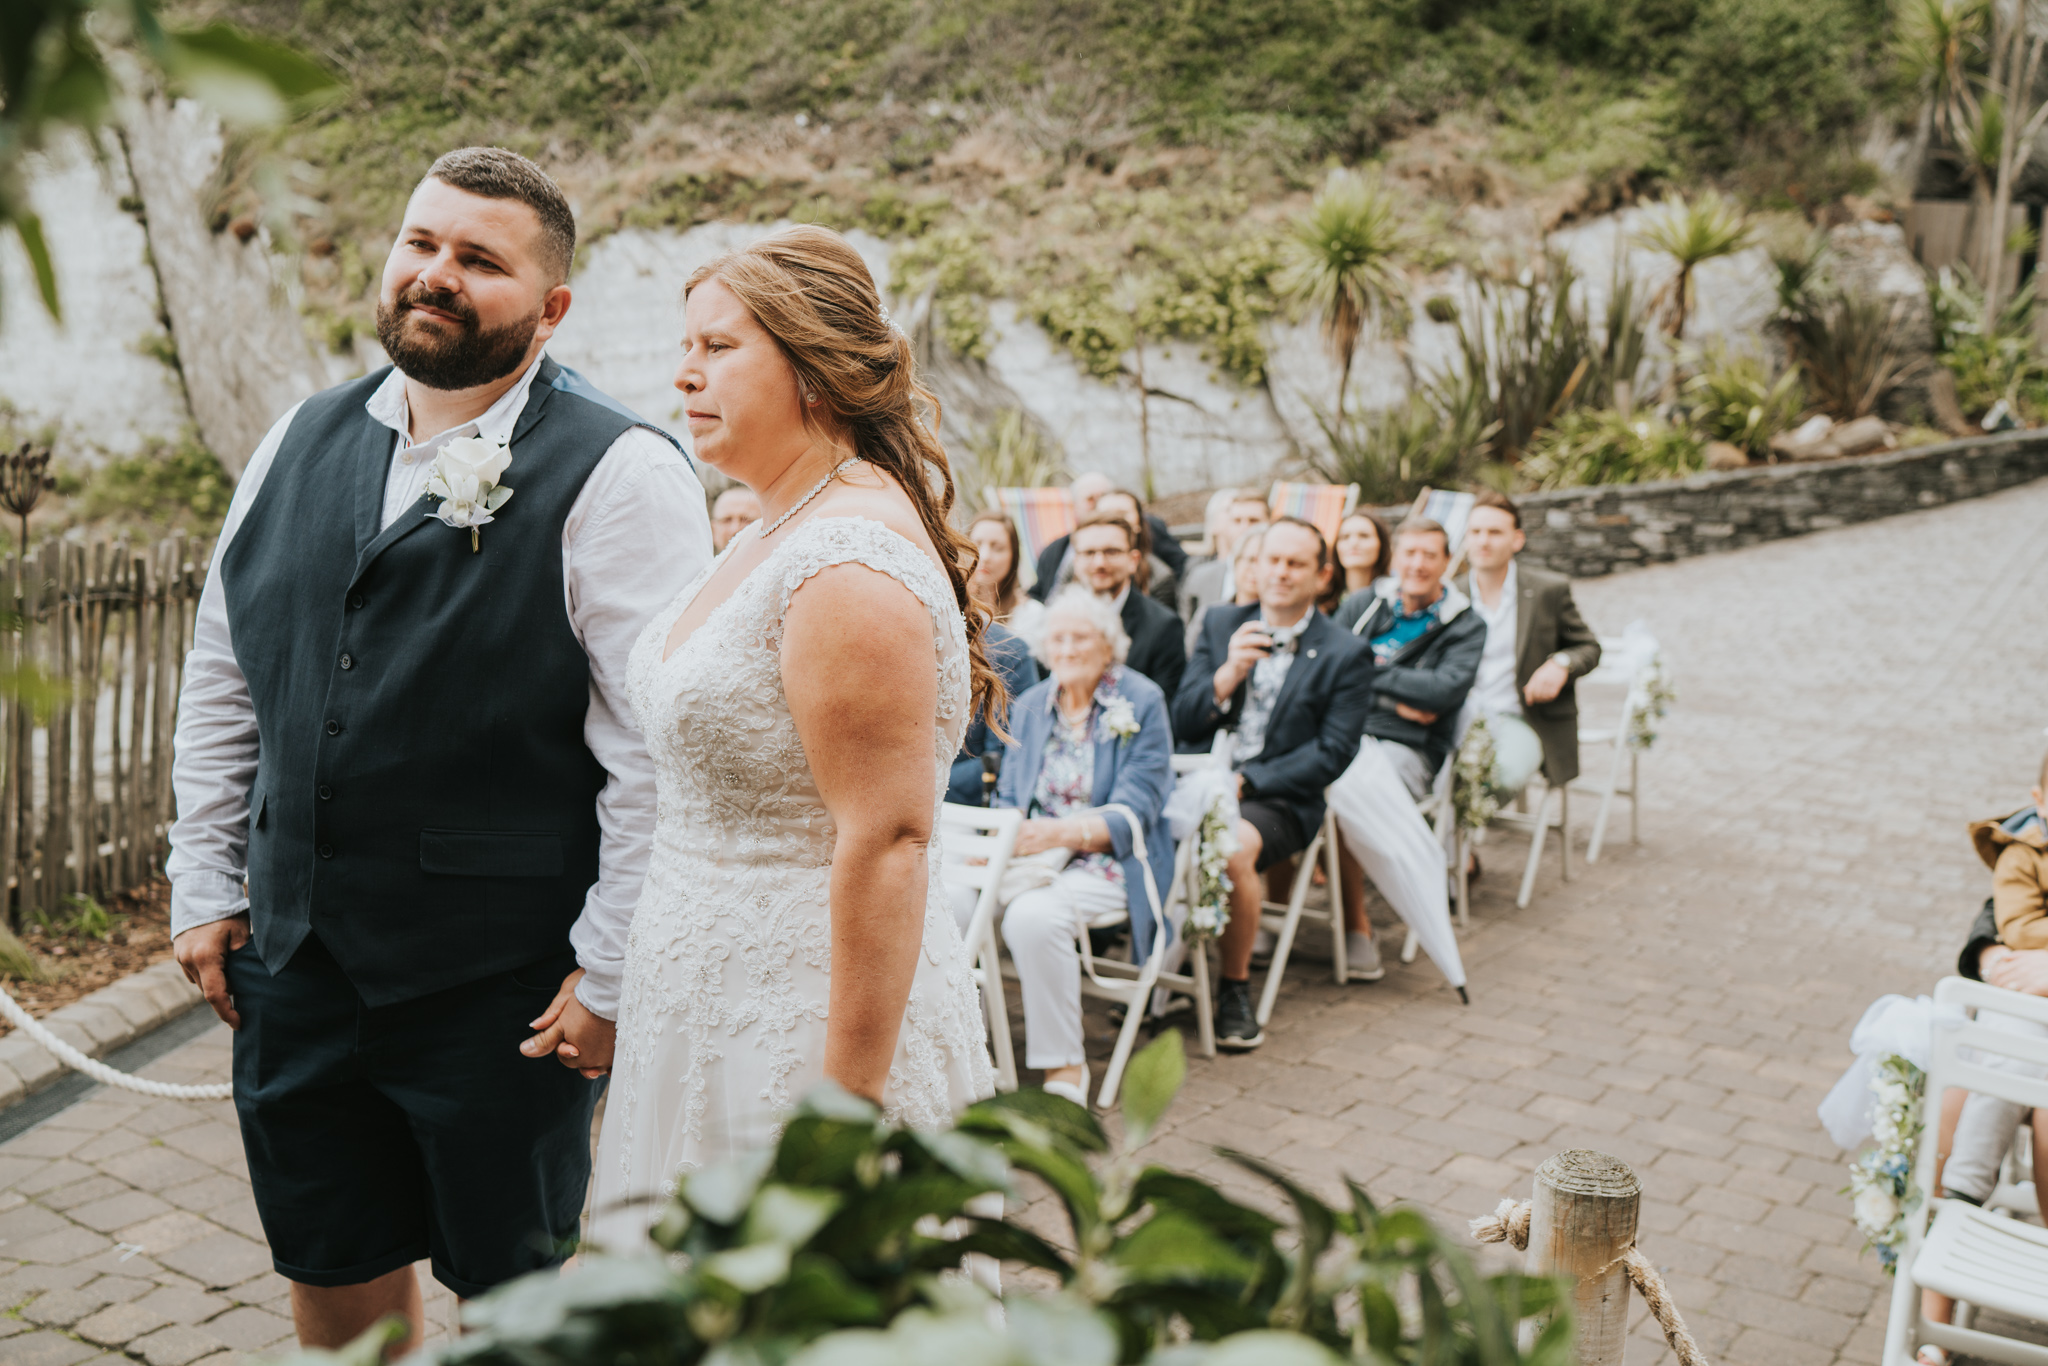 john-amy-relaxed-beach-wedding-tunnels-beaches-ilfracombe-north-devon-grace-elizabeth-colchester-essex-alternative-relaxed-wedding-photography-devon-suffolk-norfolk-essex (56 of 159).jpg